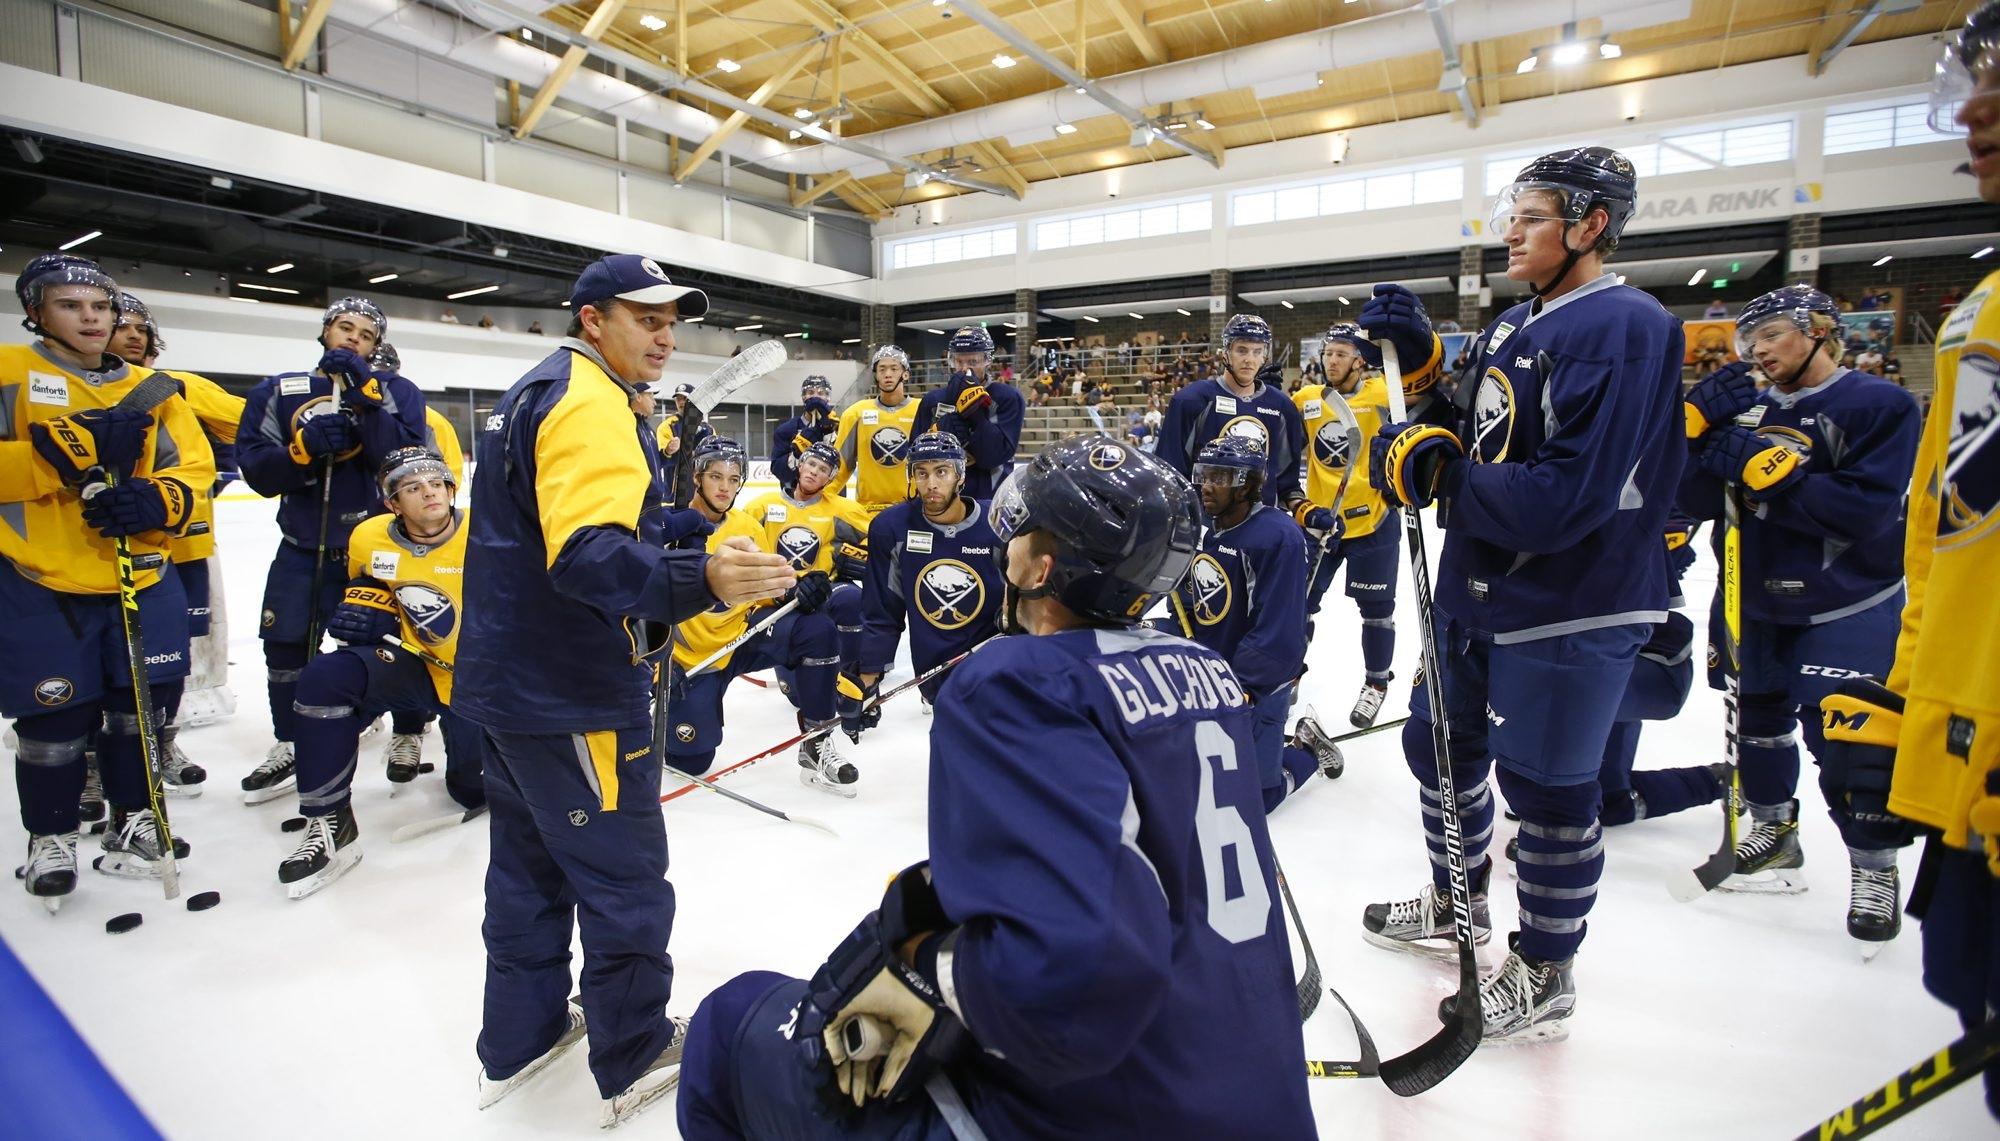 Rochester Amerks coach Dan Lambert has a larger role in his second Buffalo Sabres development camp.